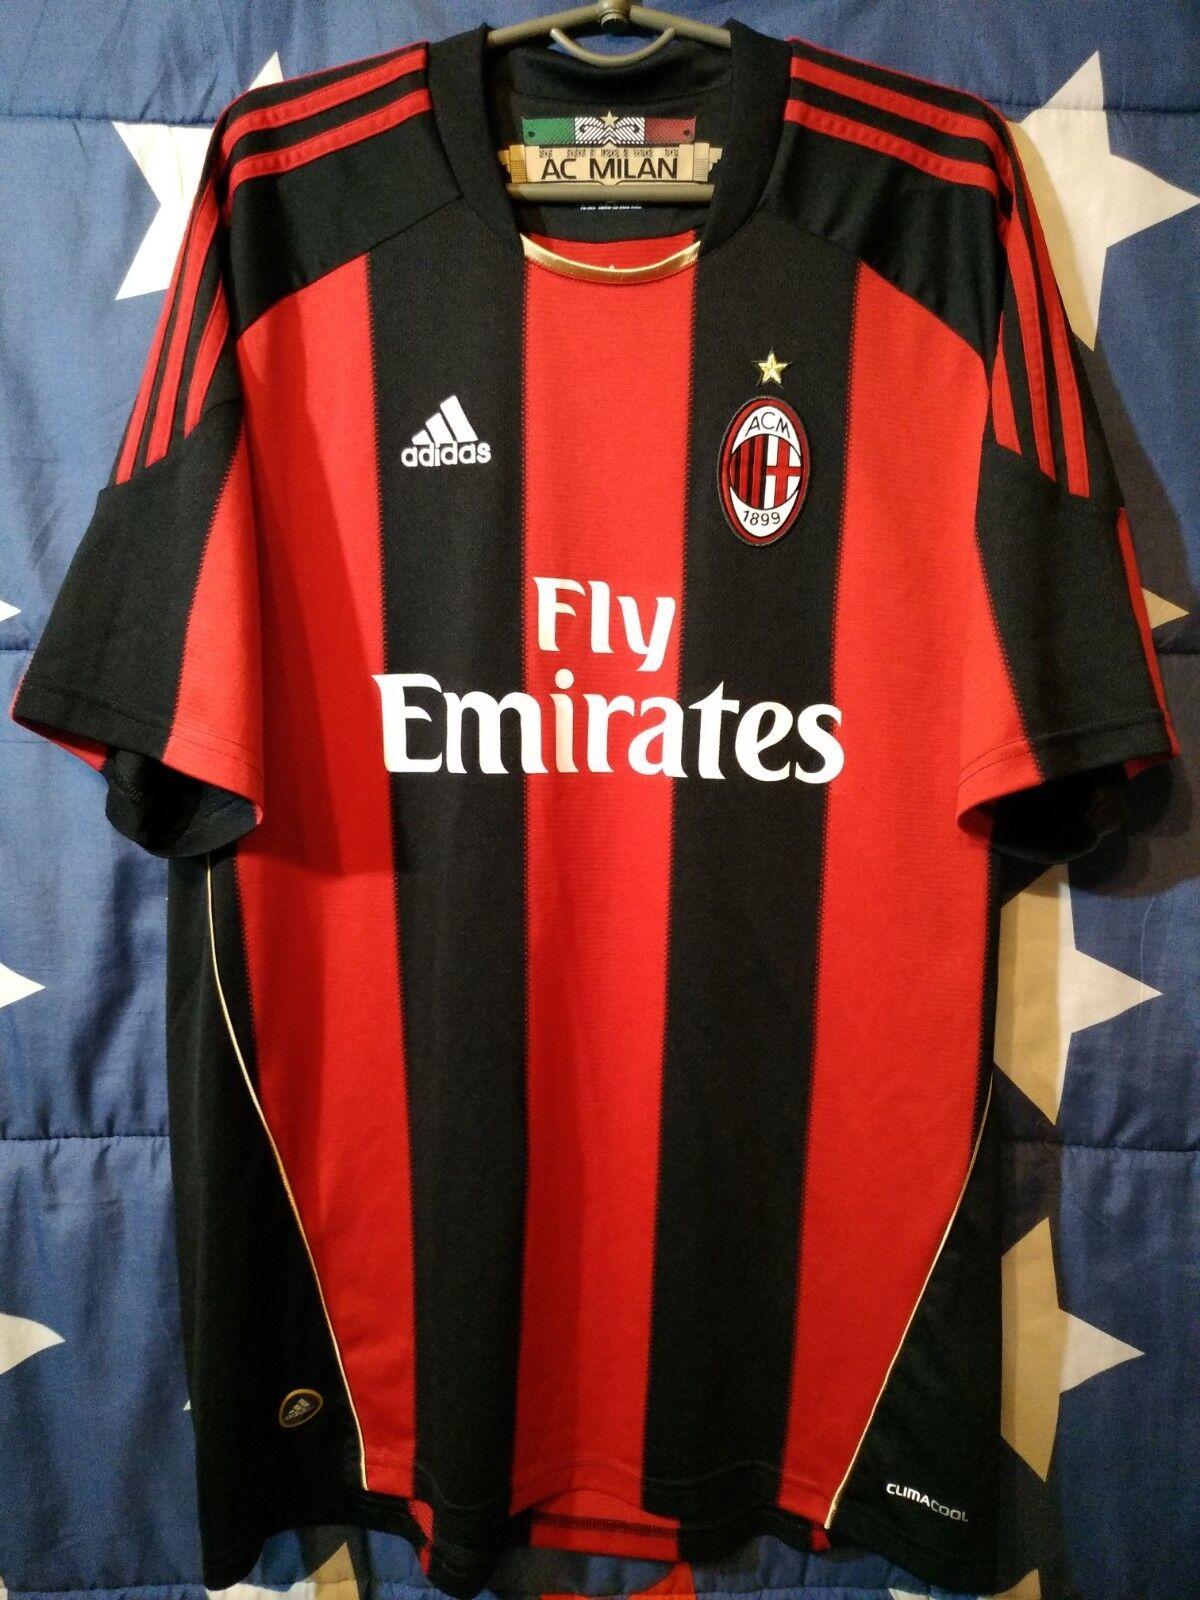 Talla XL AC MILAN ITALY 2010-2011 HOME FOOTBALL SHIRT JERSEY MAGLIA ADIDAS